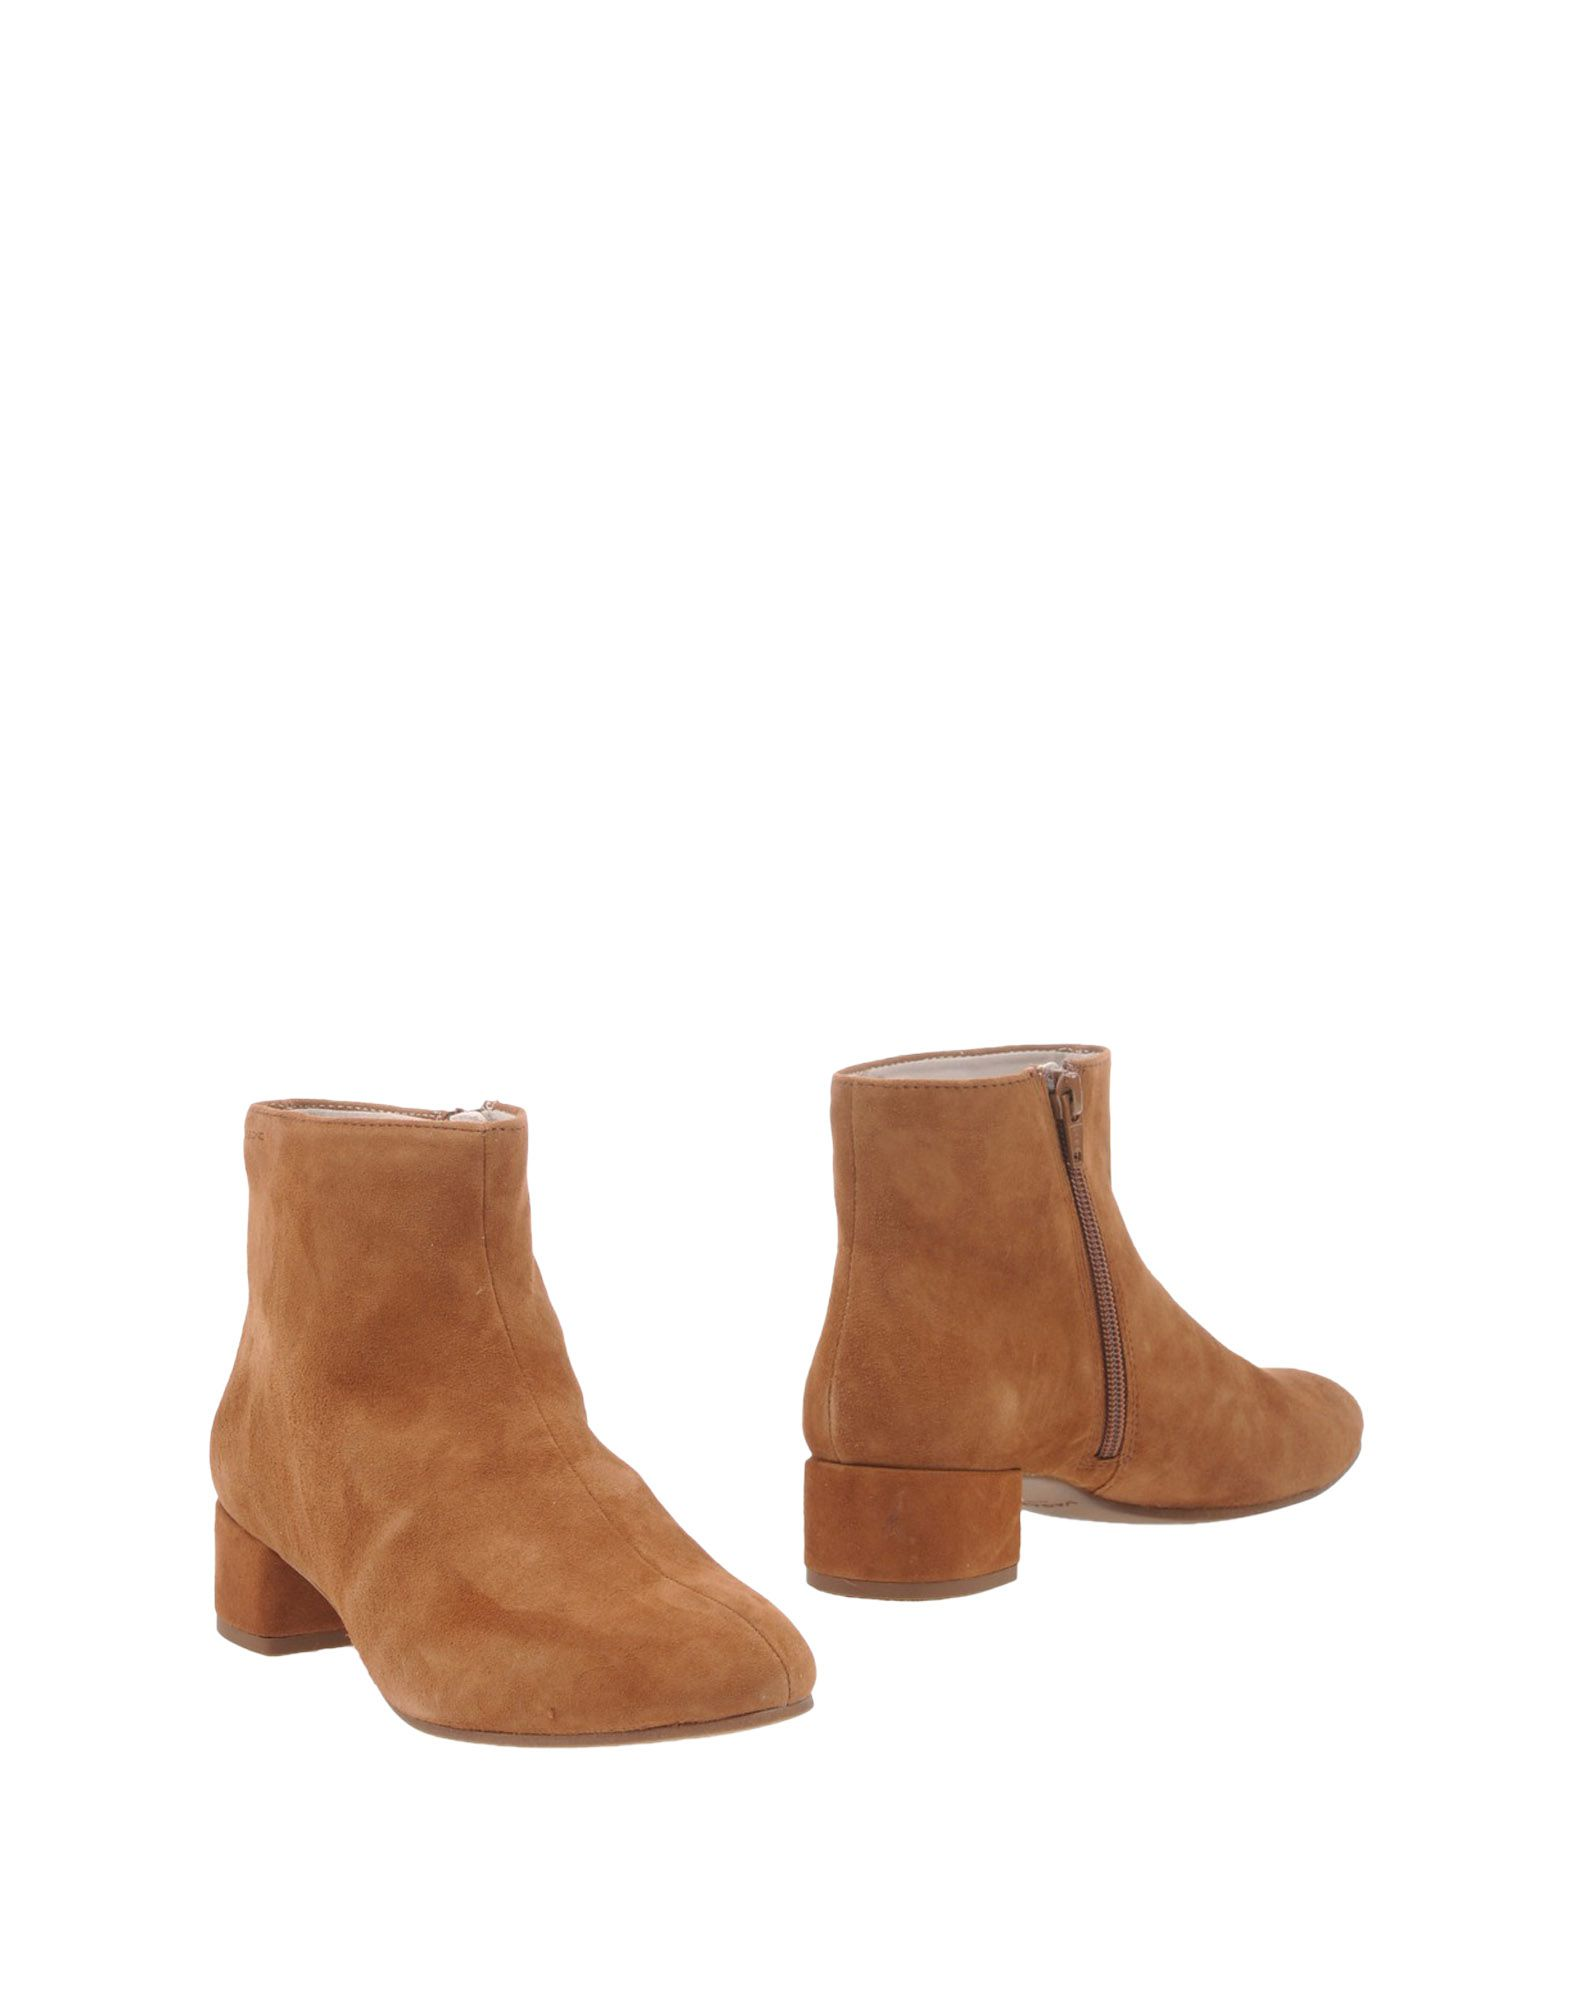 Stilvolle billige Schuhe Damen Vagabond Shoemakers Stiefelette Damen Schuhe  11227065IG a33f7f